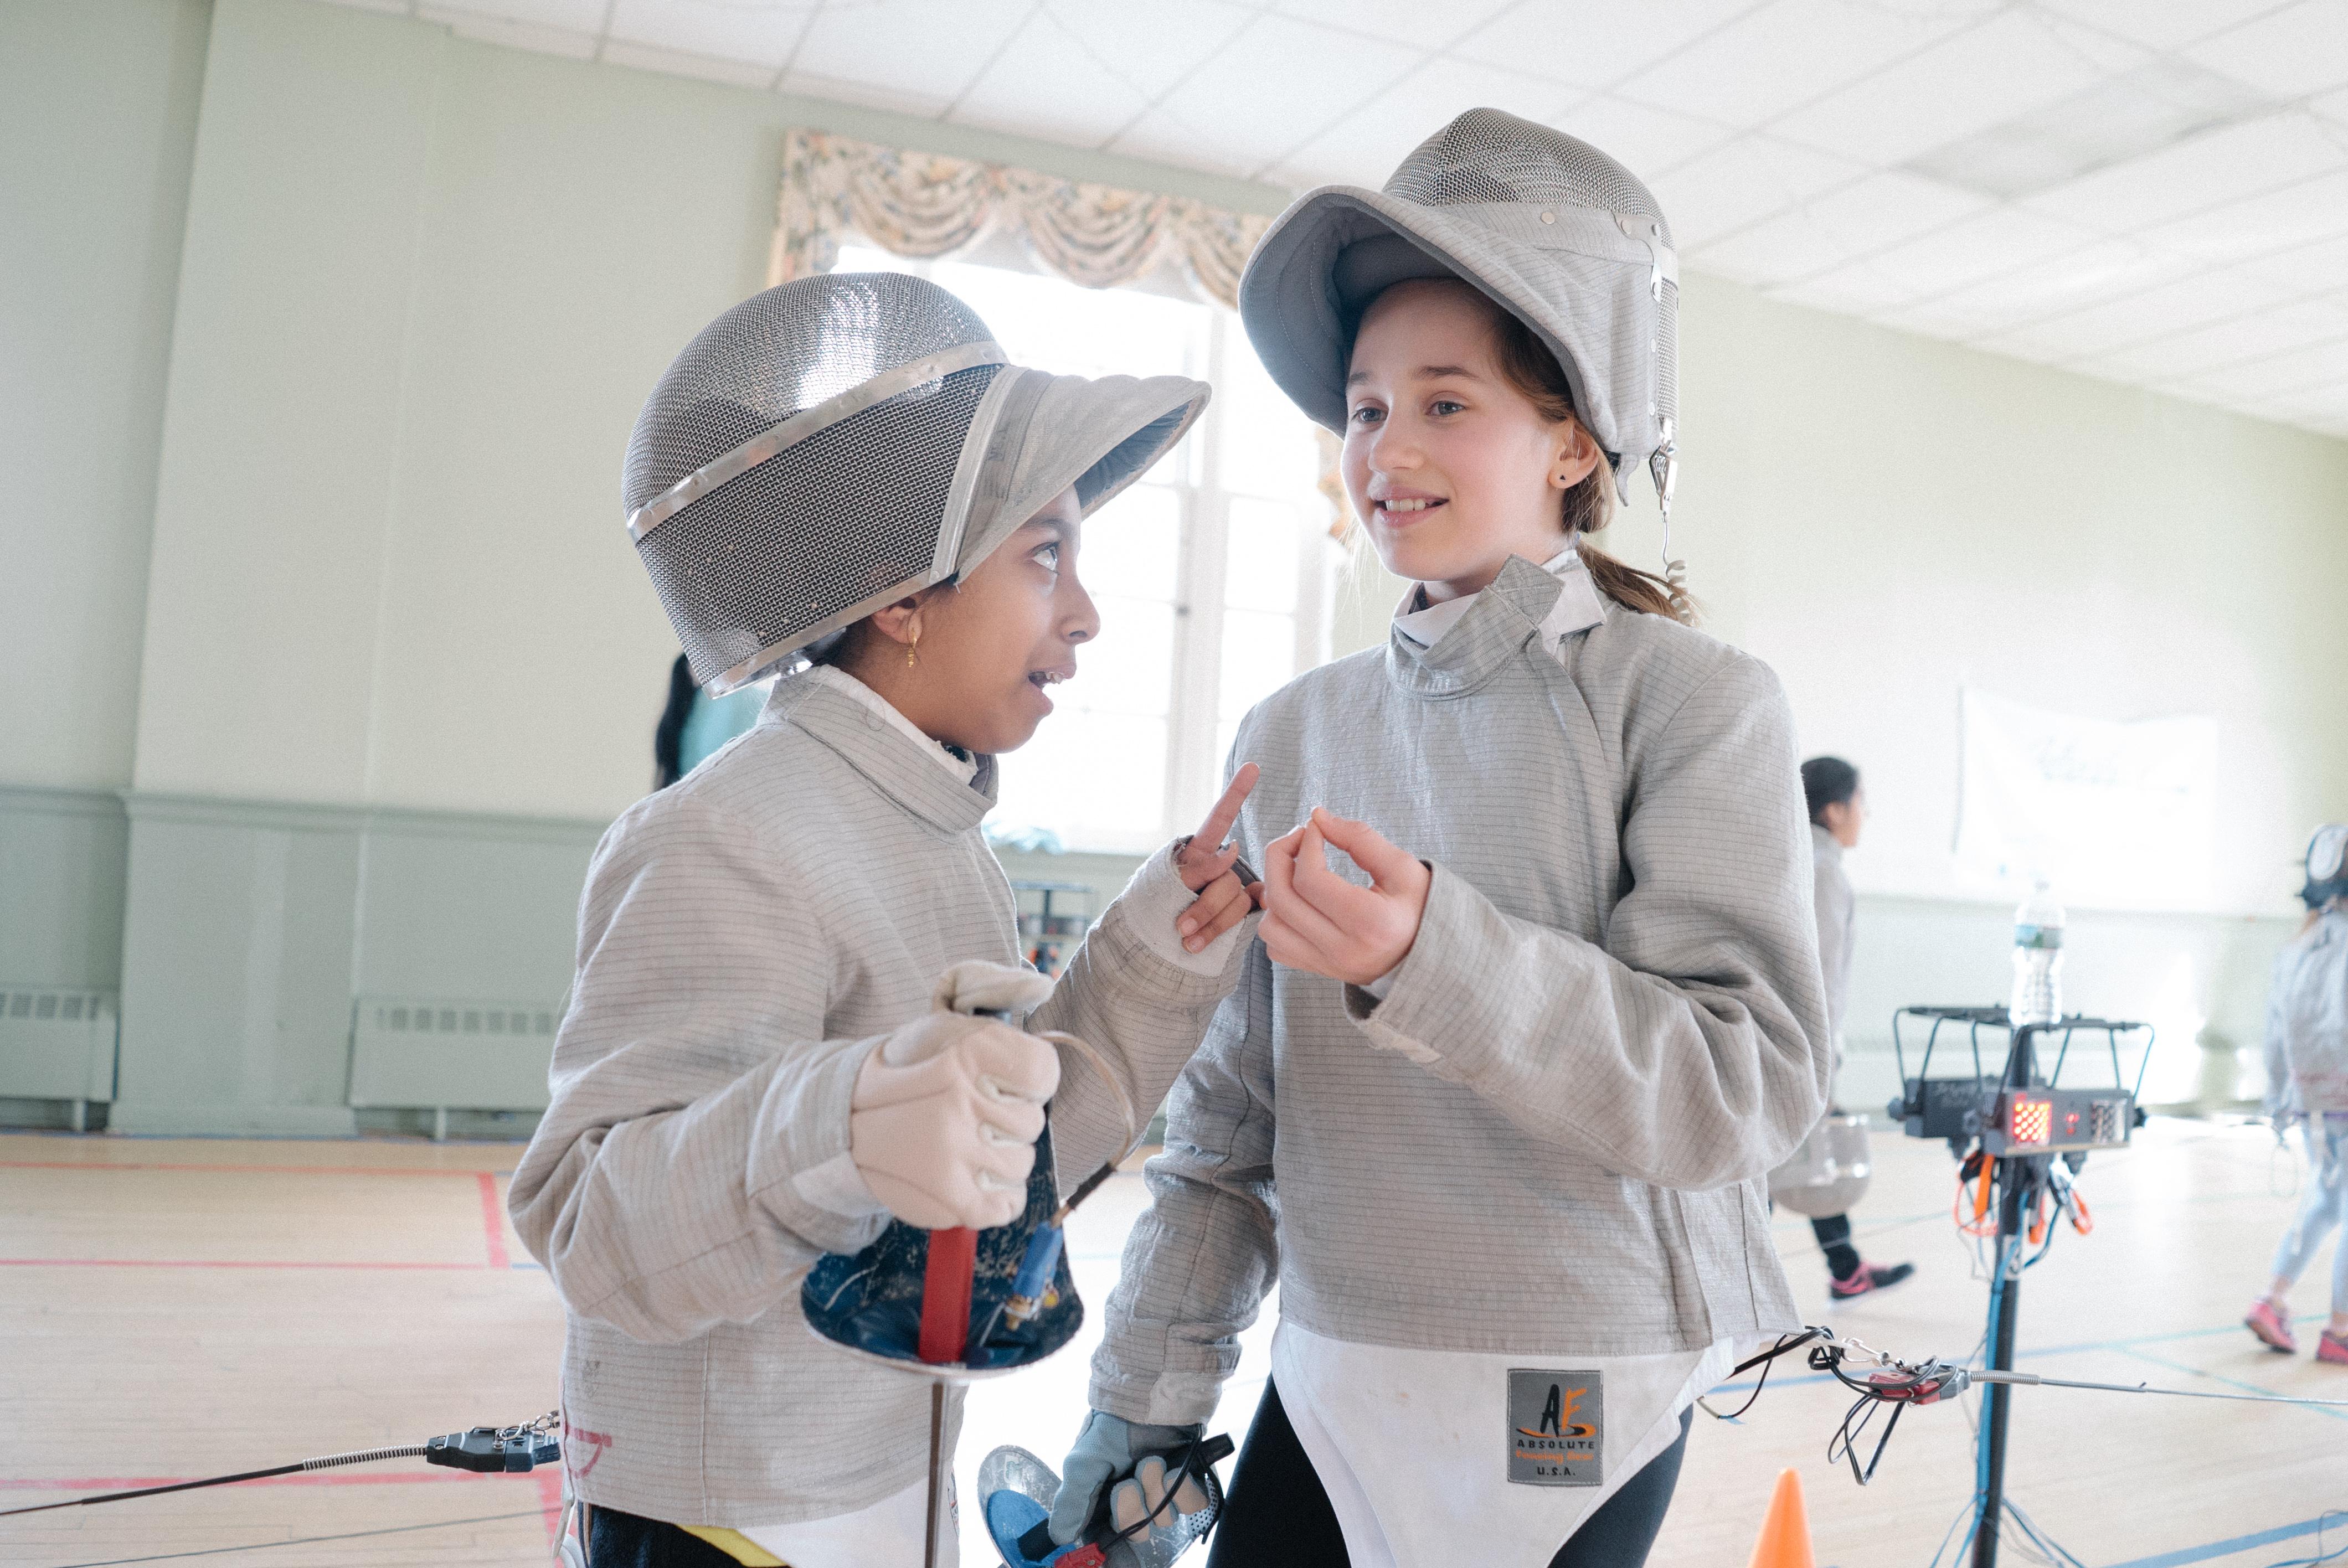 fencing-10.jpg